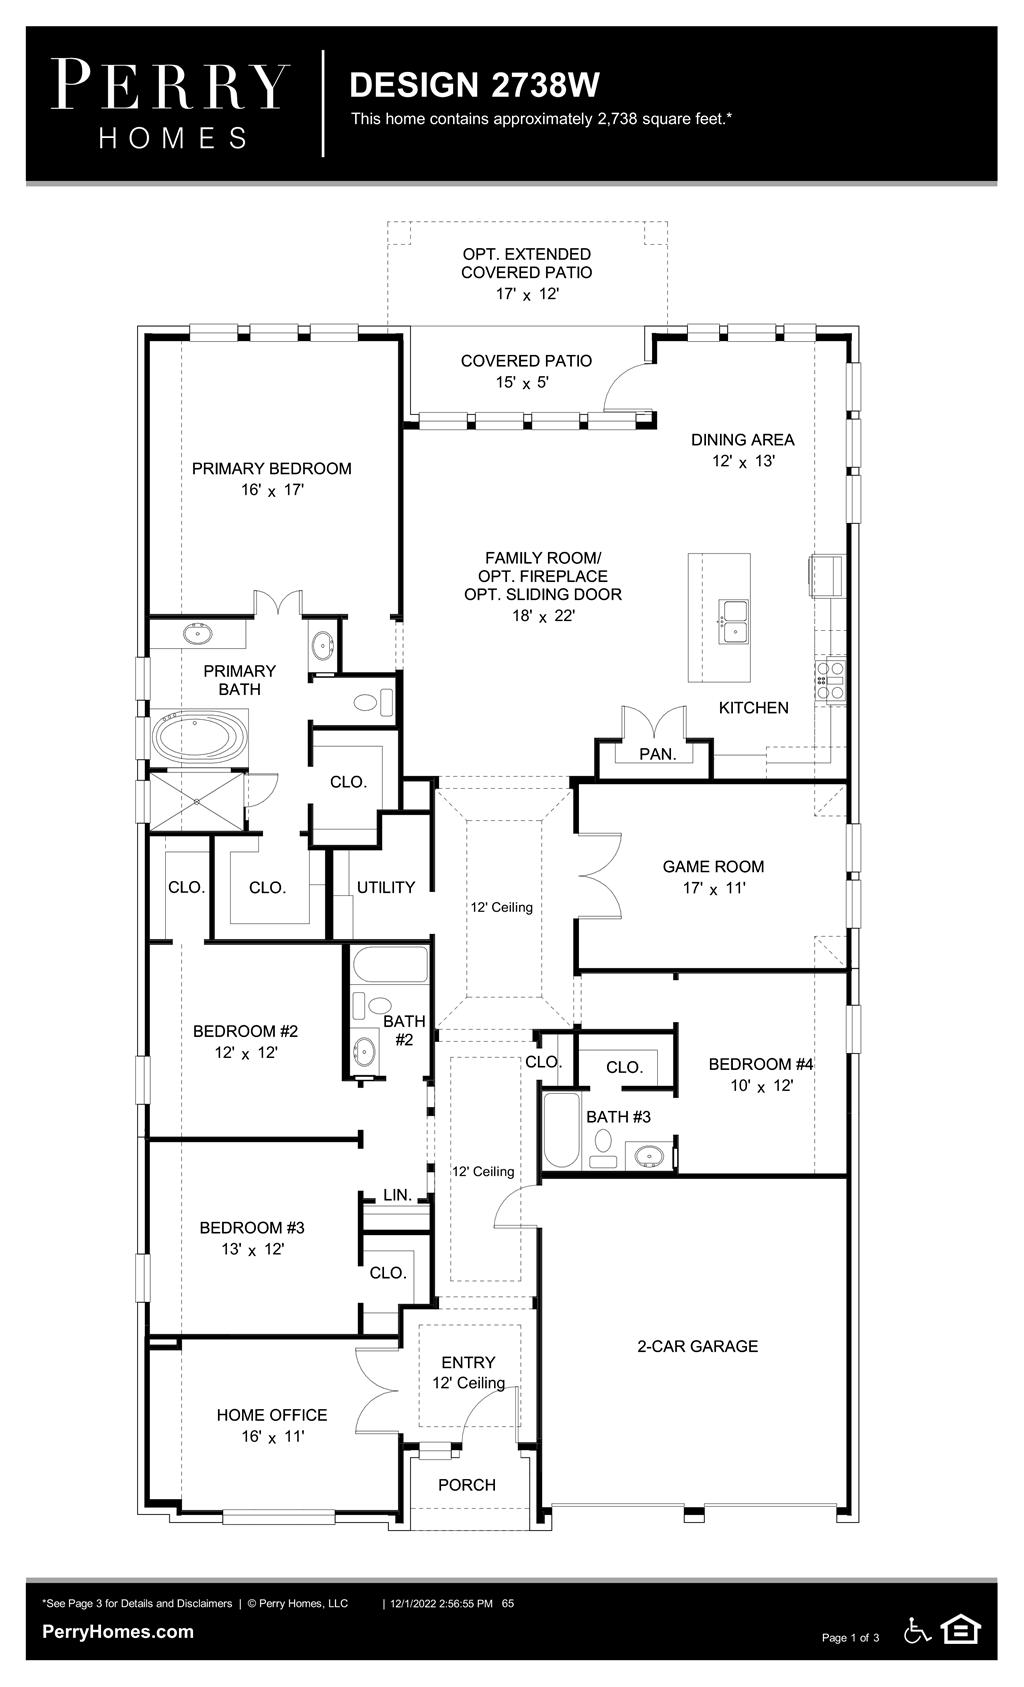 Floor Plan for 2738W